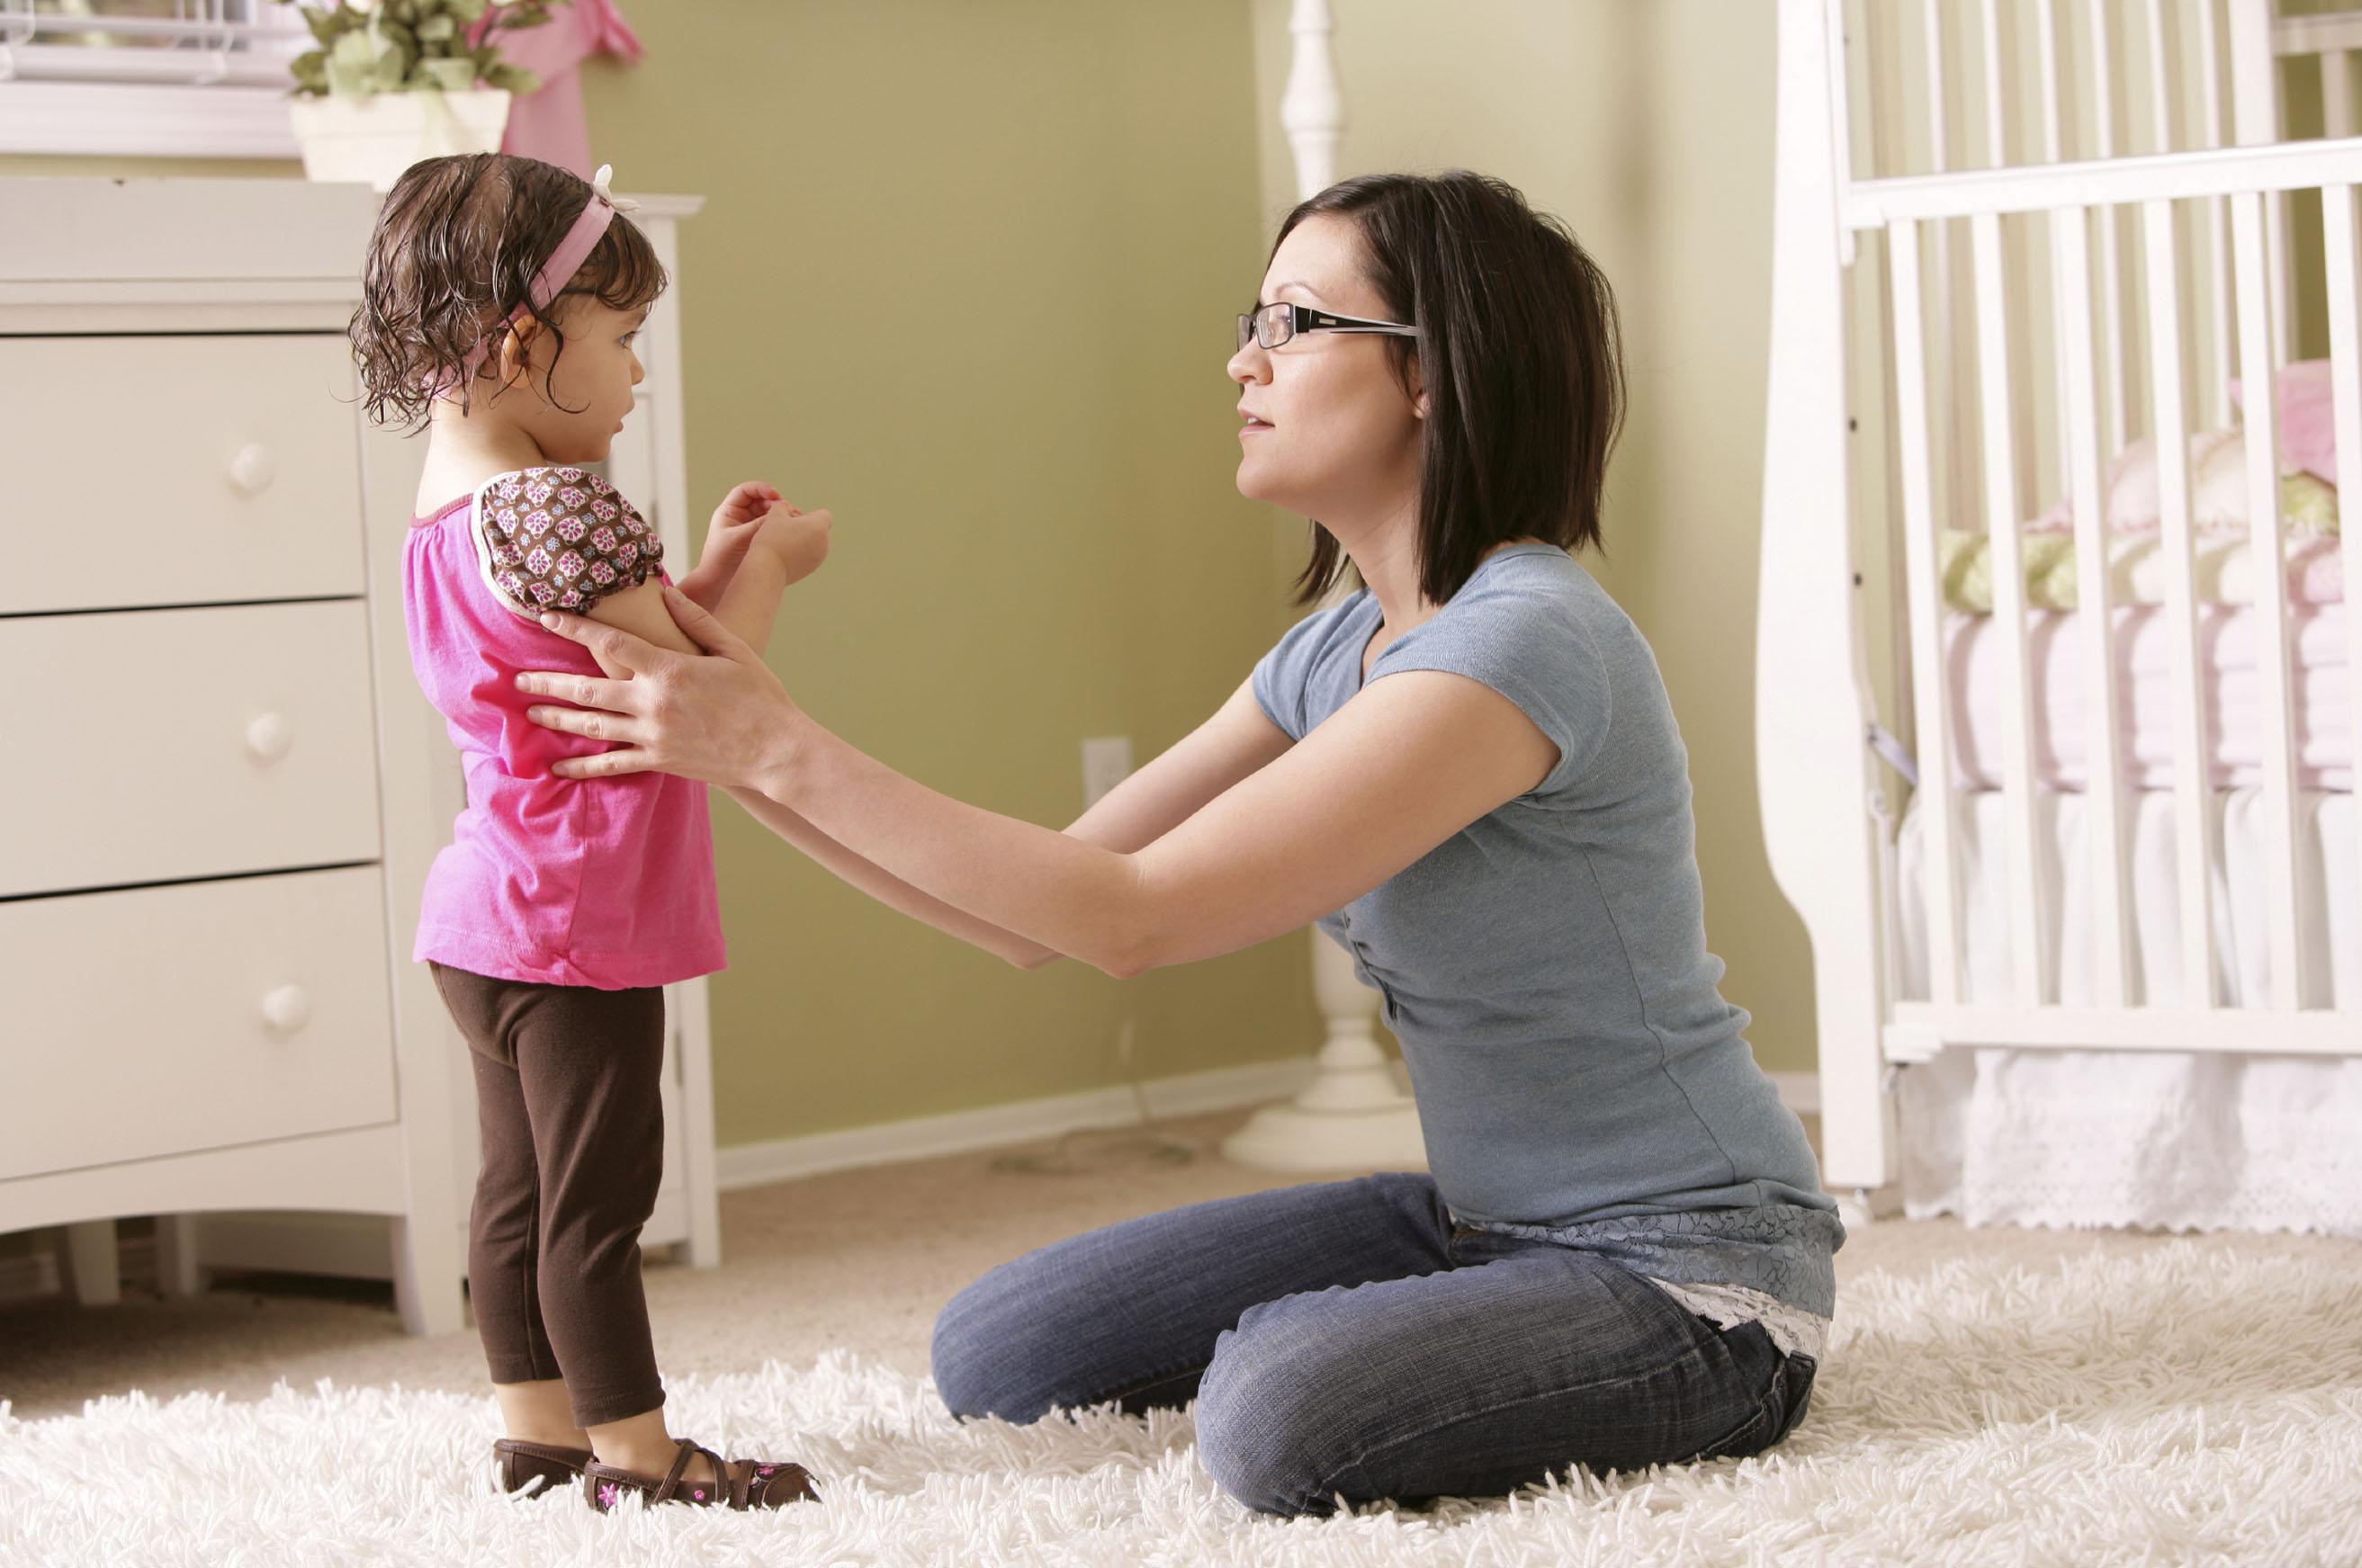 Childrens behavior